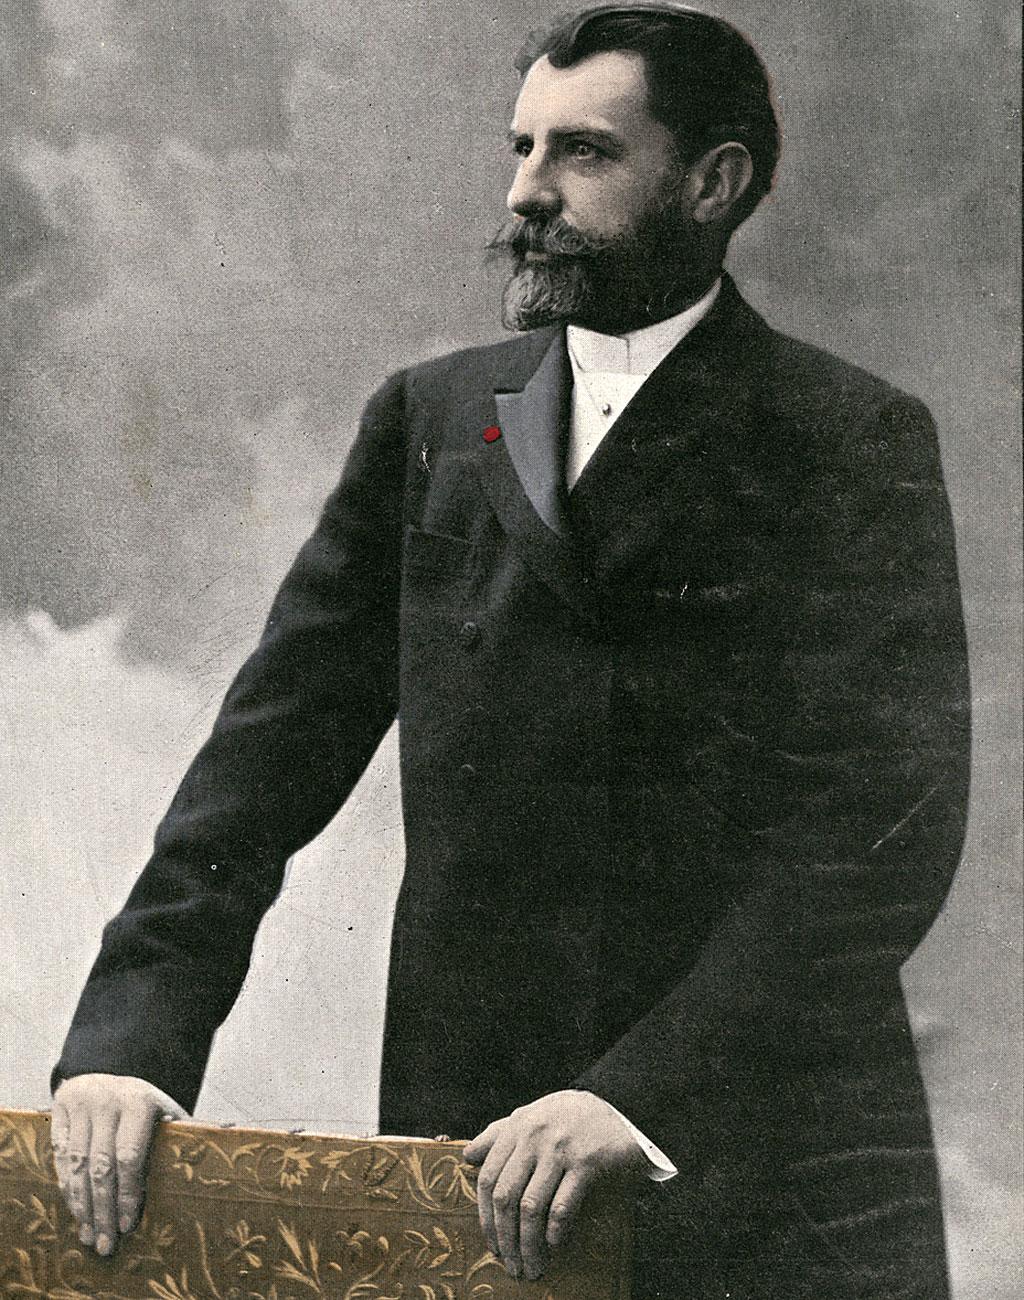 Samuel-Jean Pozzi